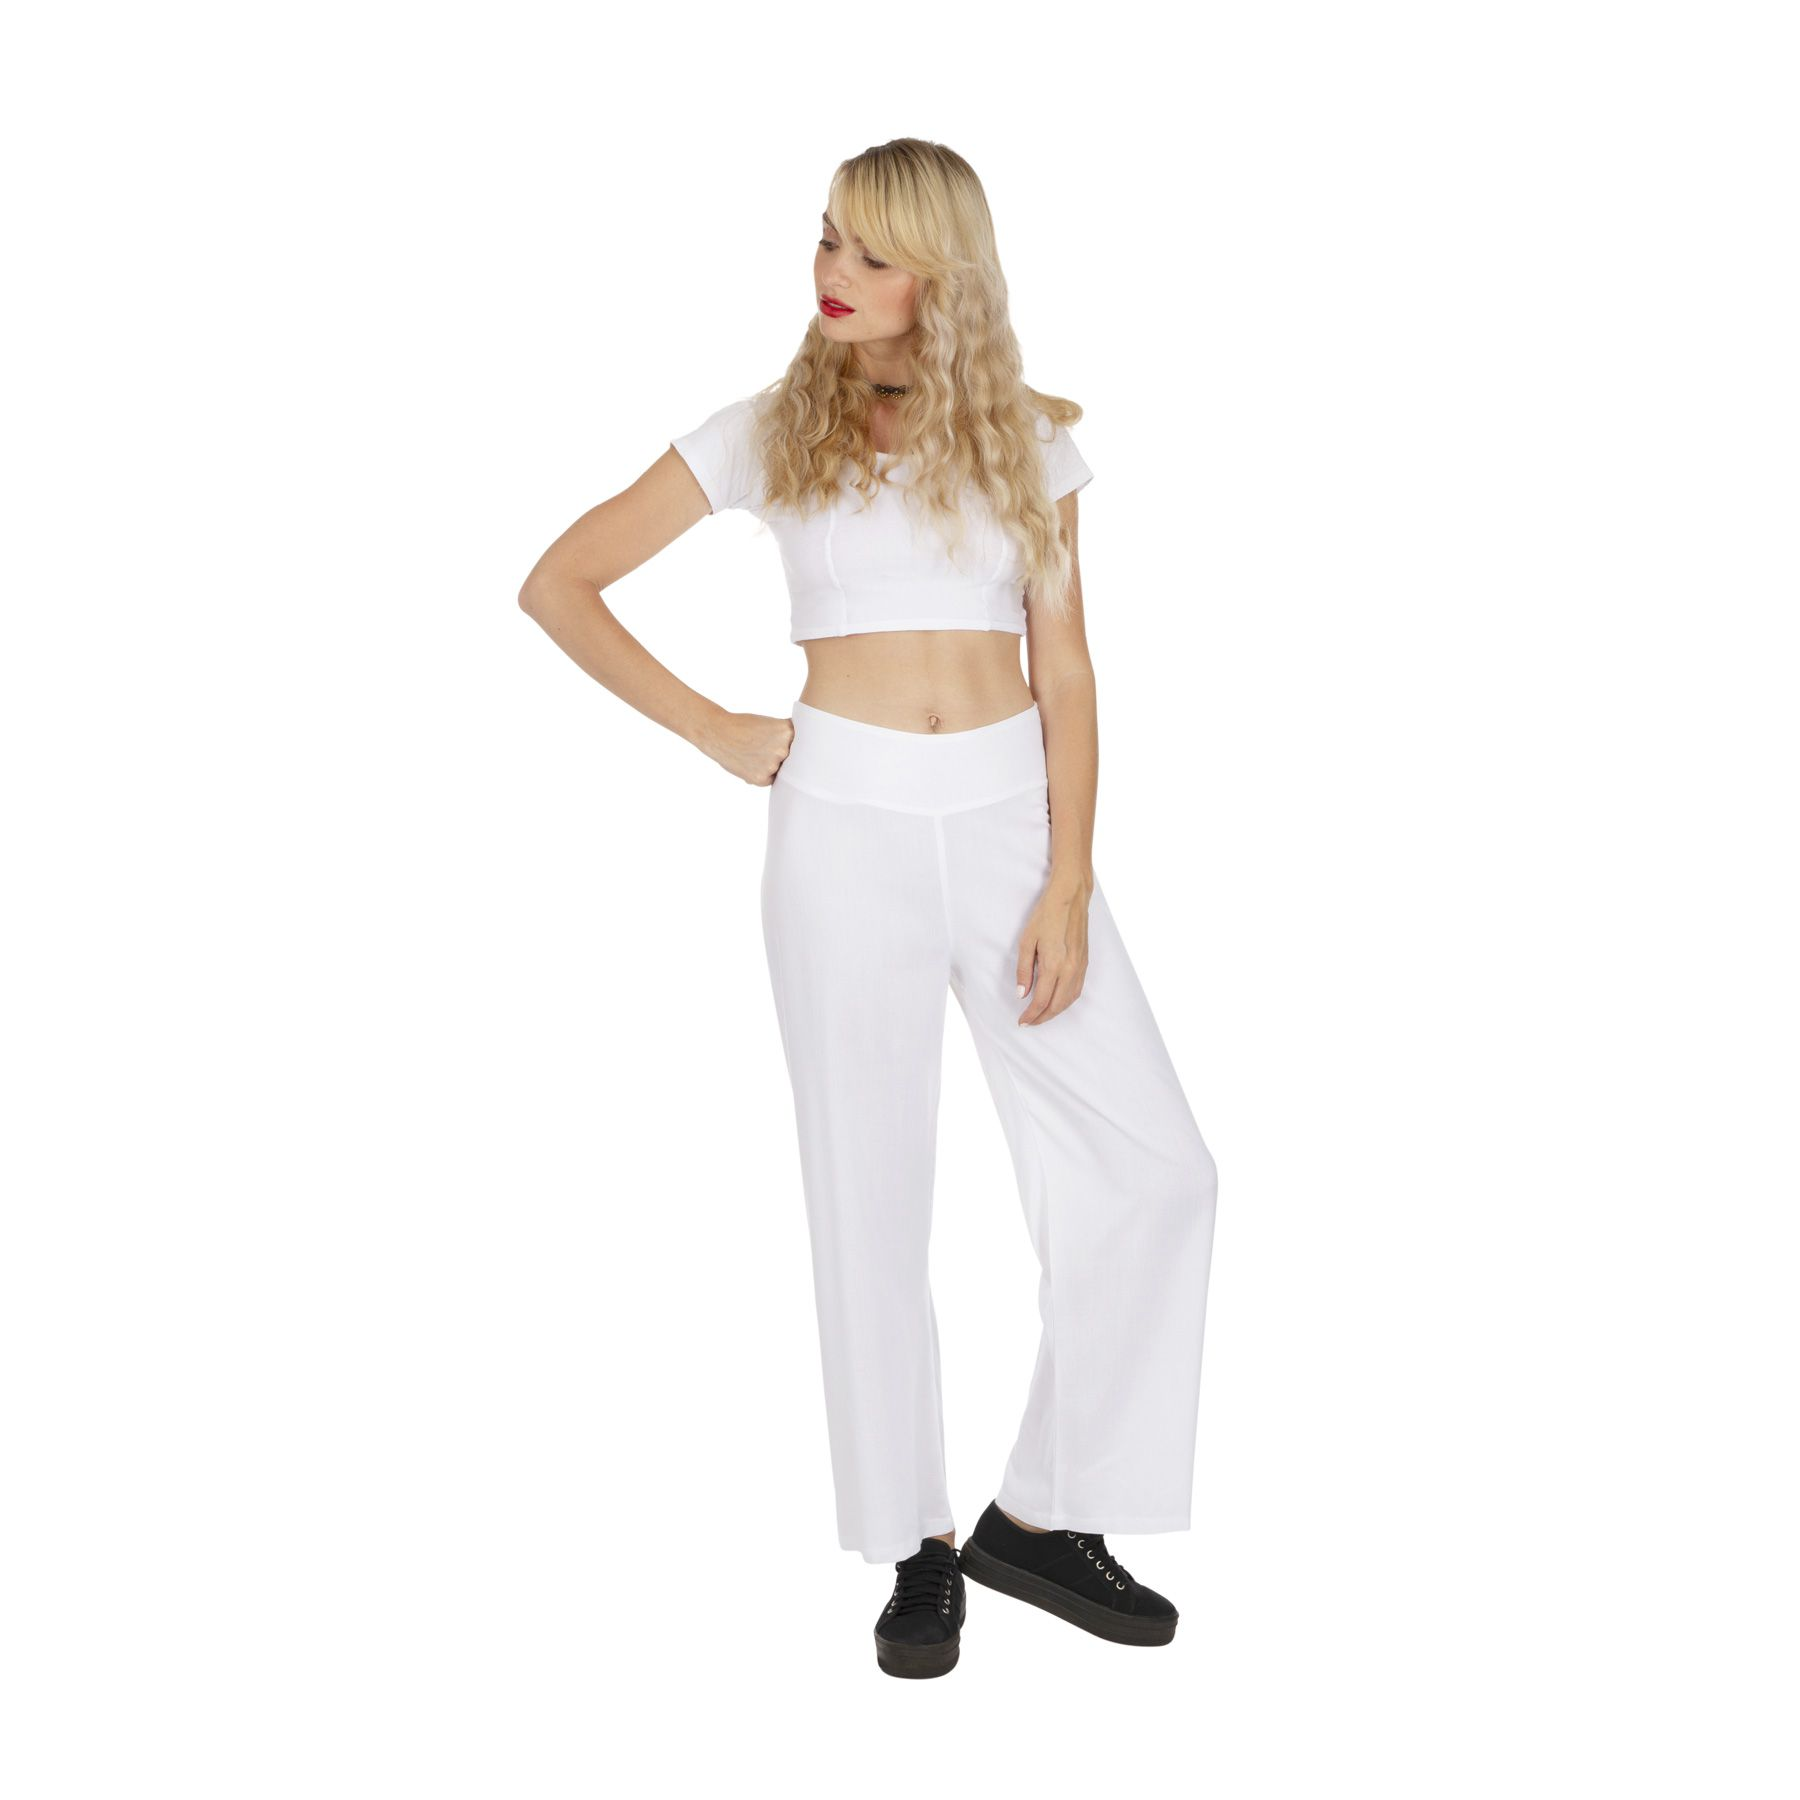 pantalon blanc femme tenue mariage chic pas cher Friendly 318392